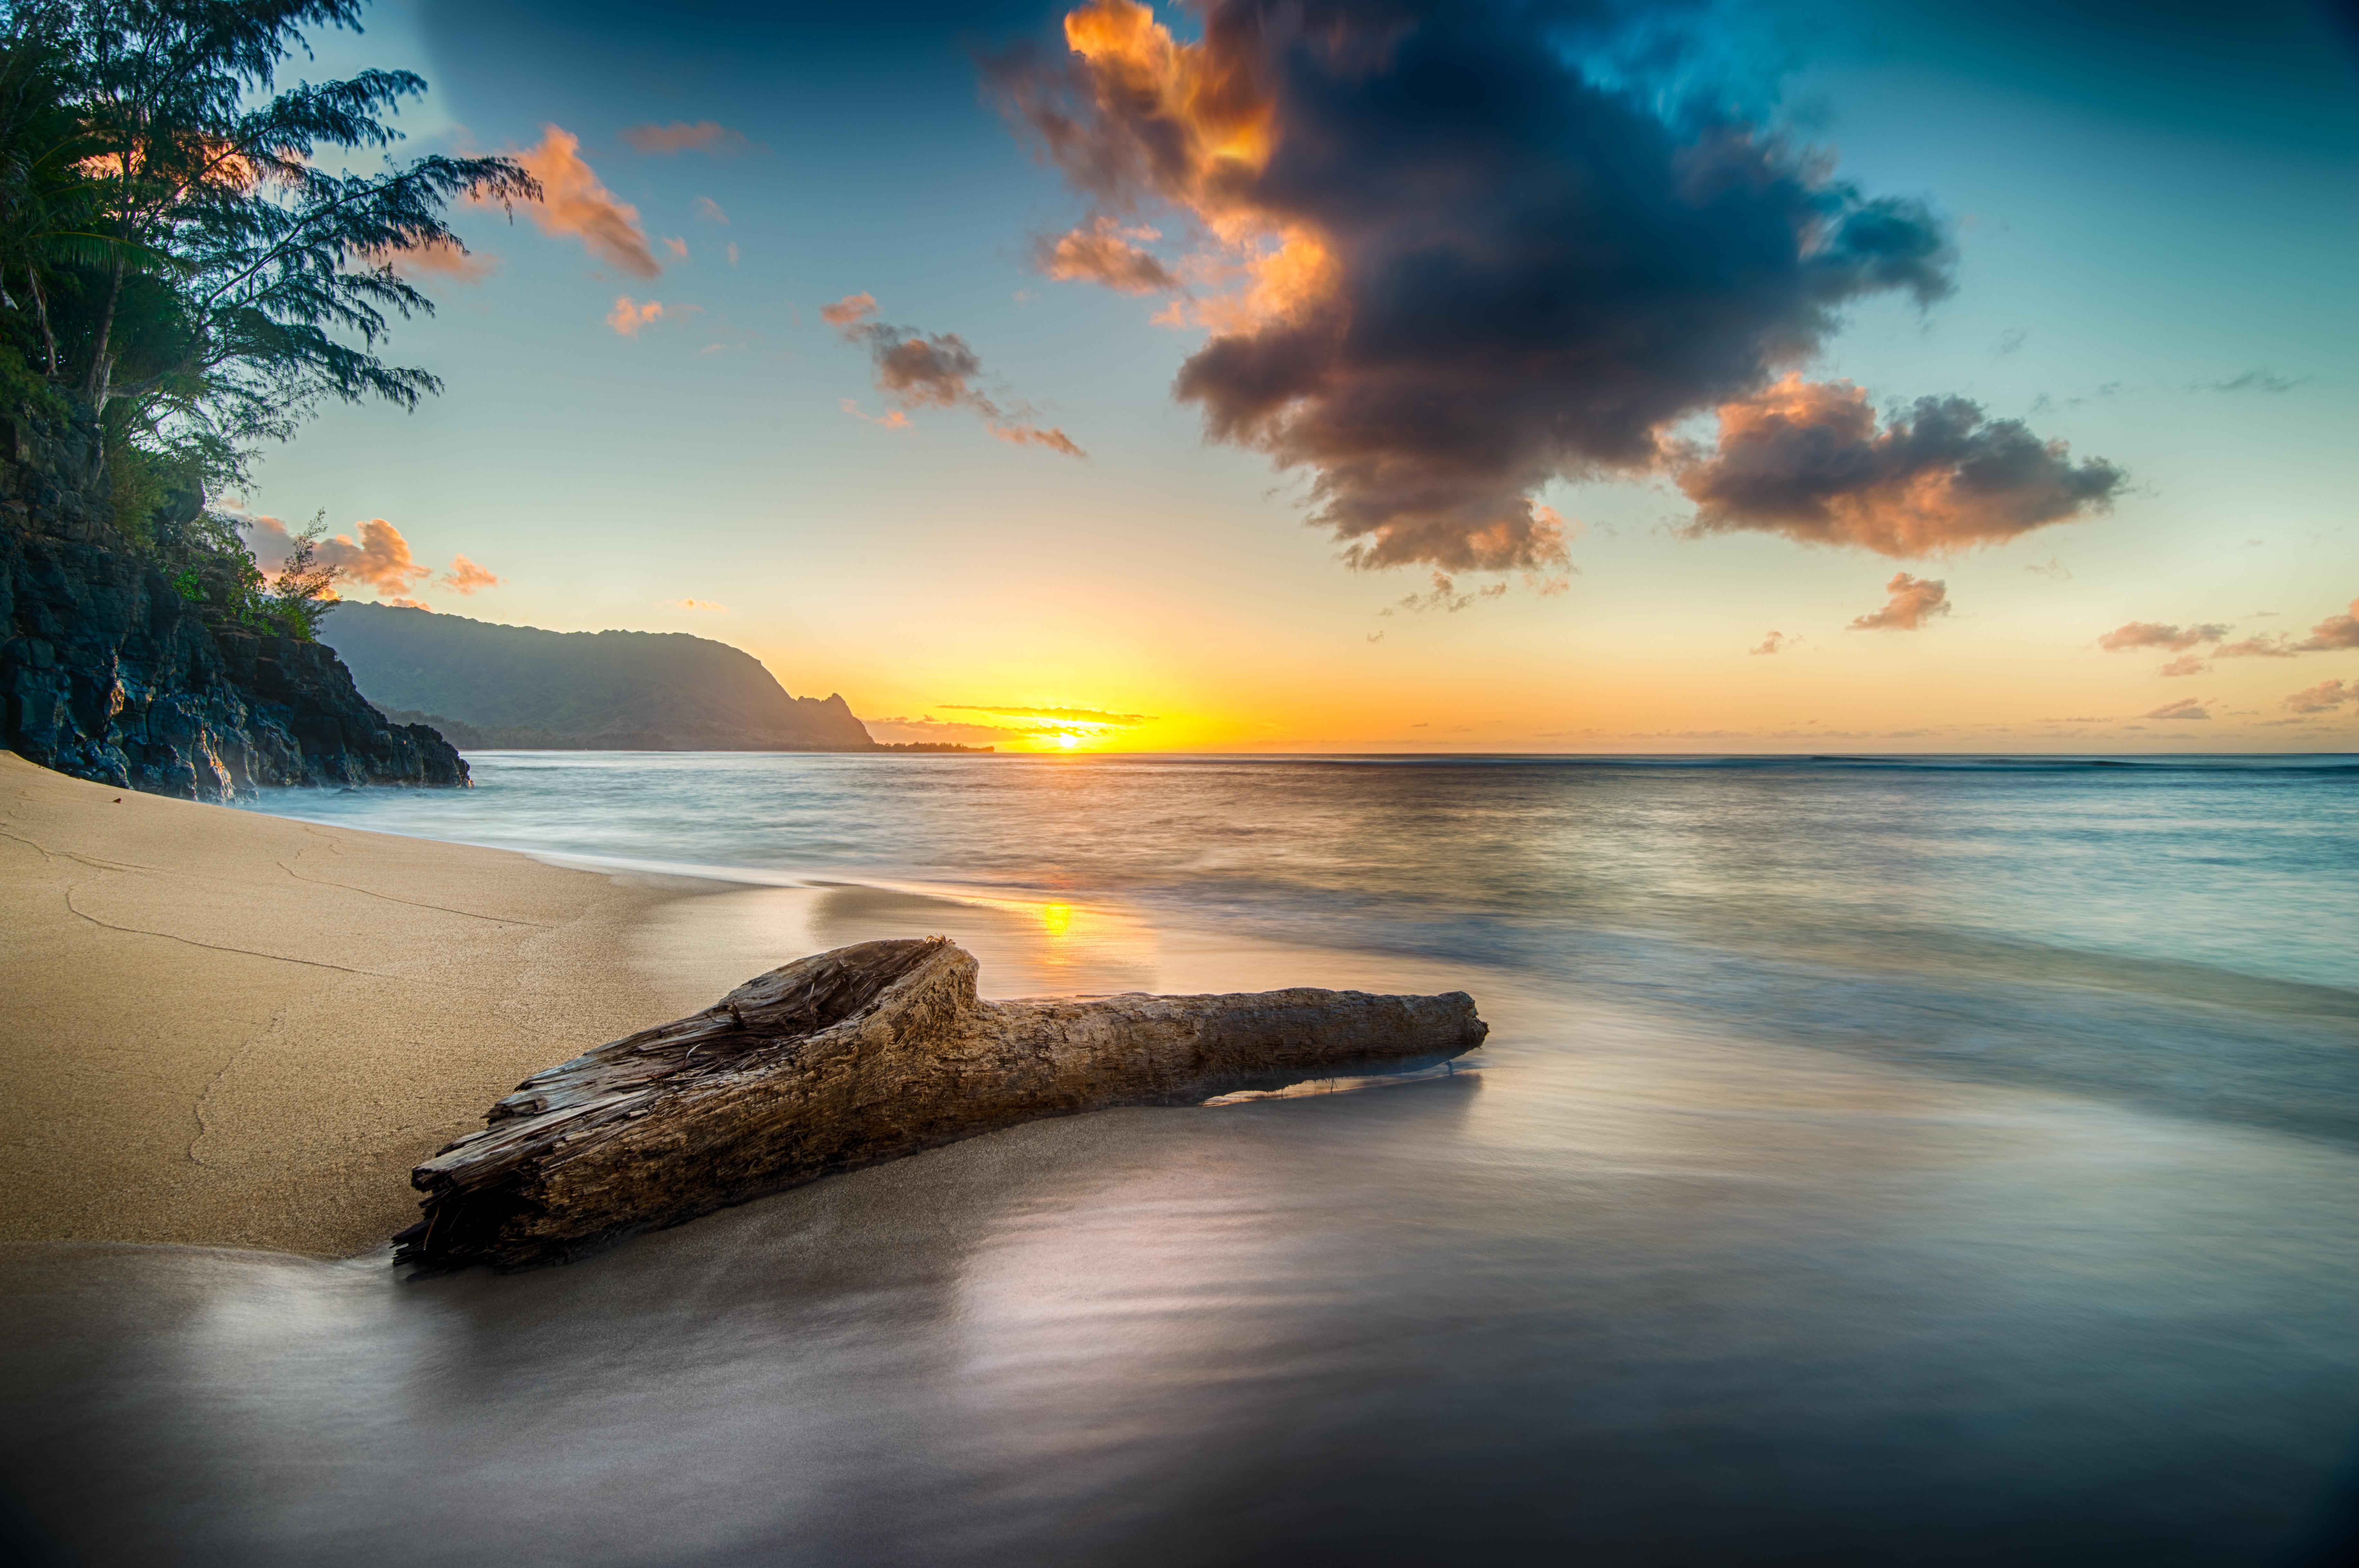 Wallpaper Beach at sunset on north shore of Kauai